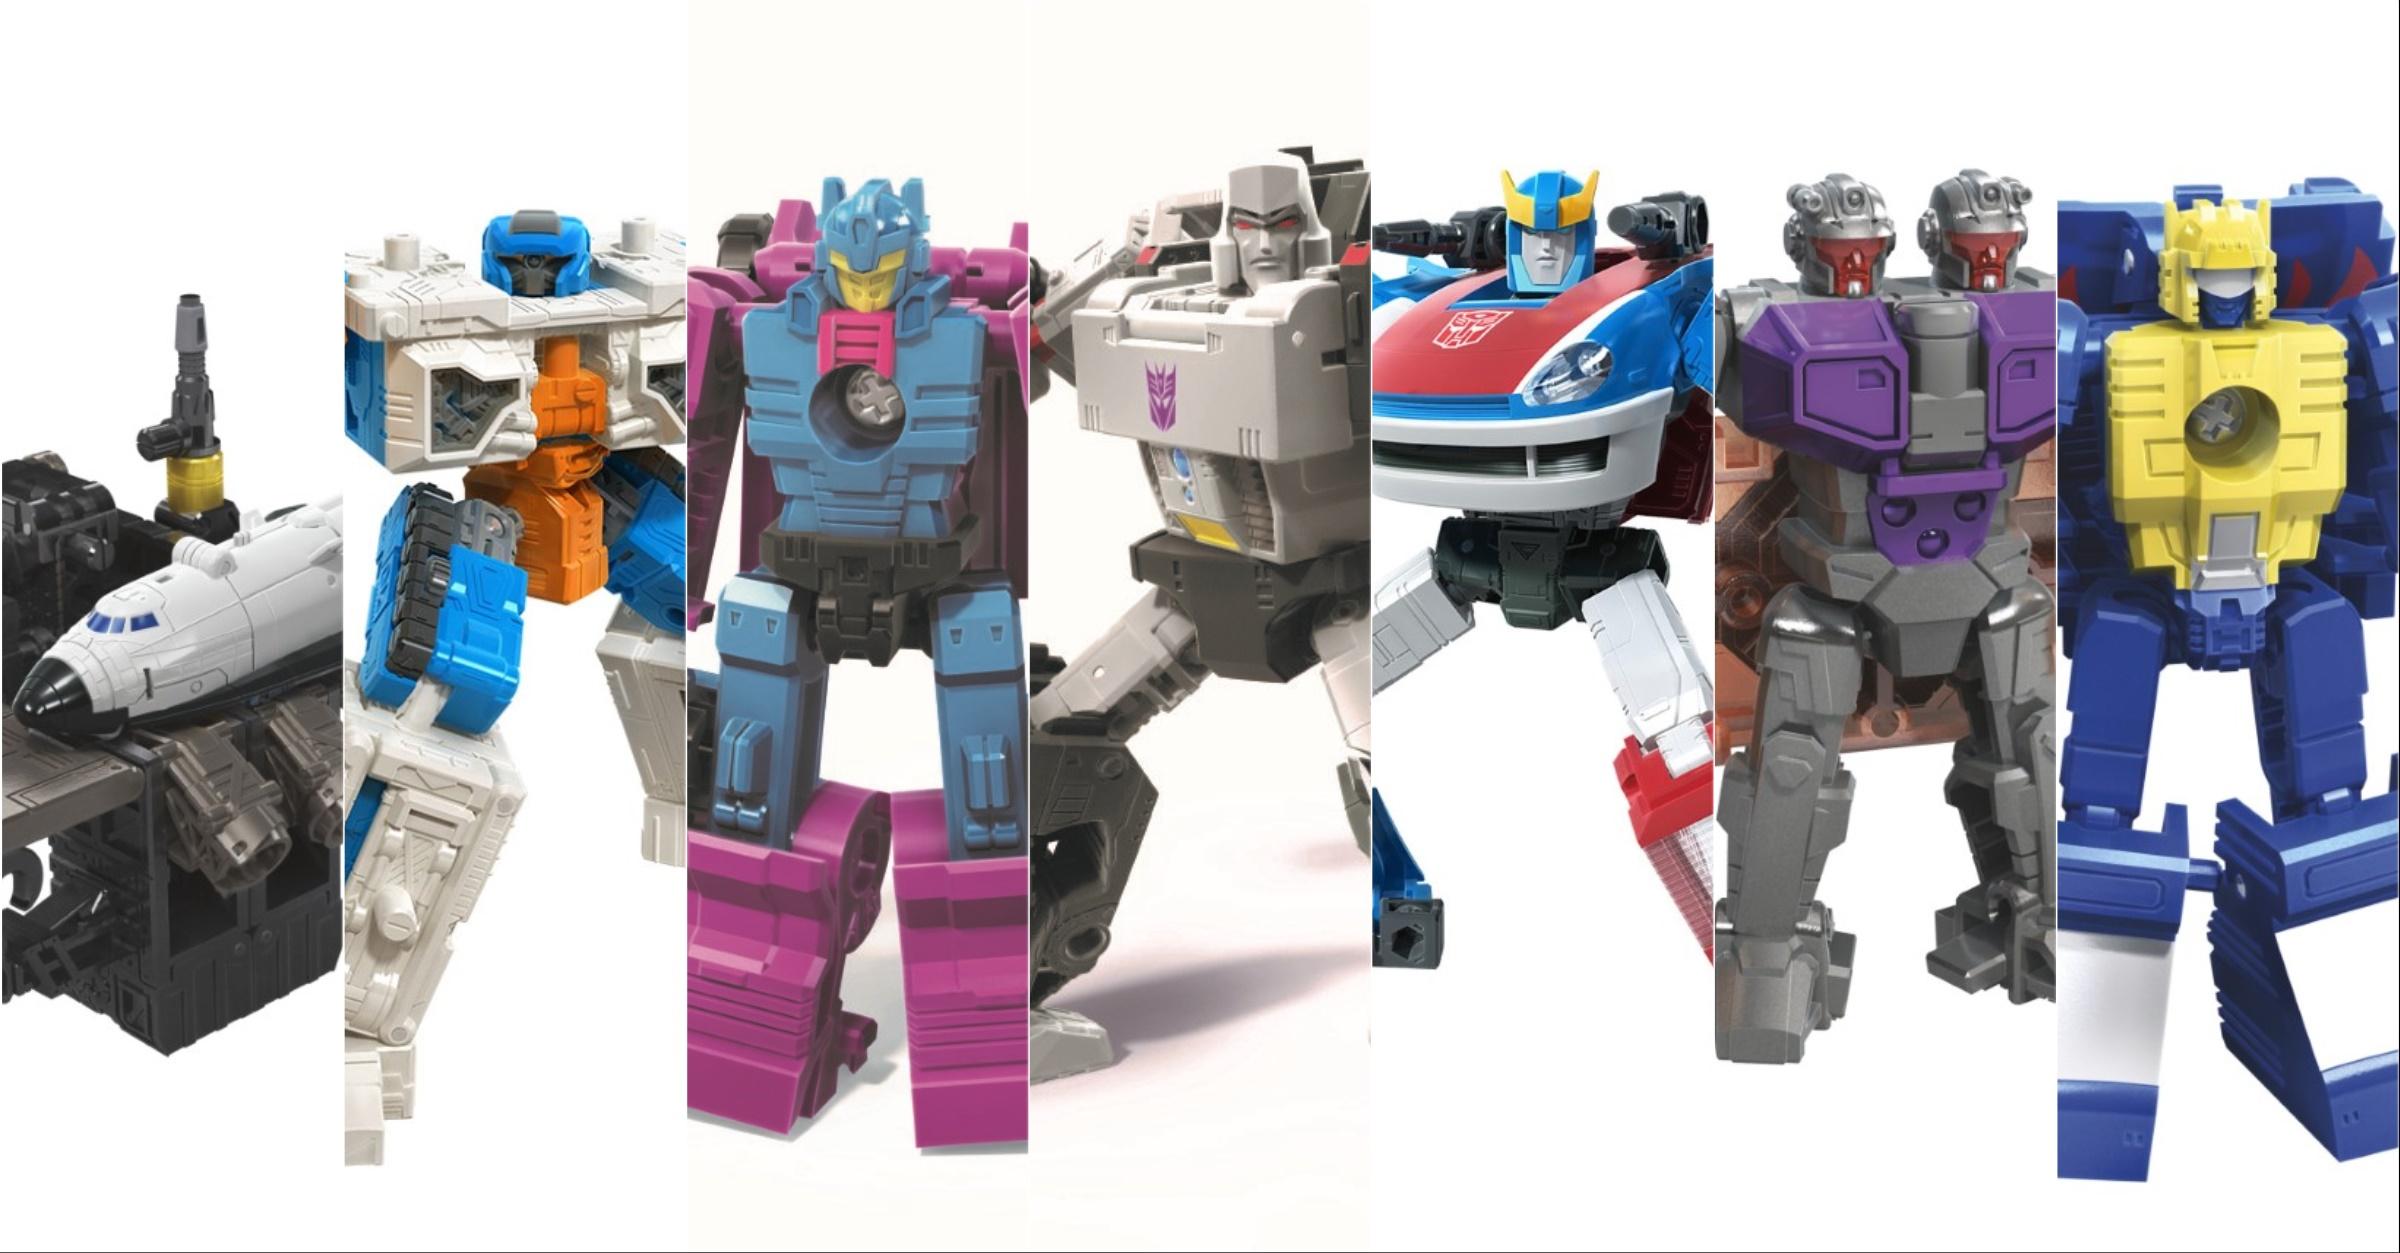 Transformers Weapon RID Megatron GUN Battle Pack